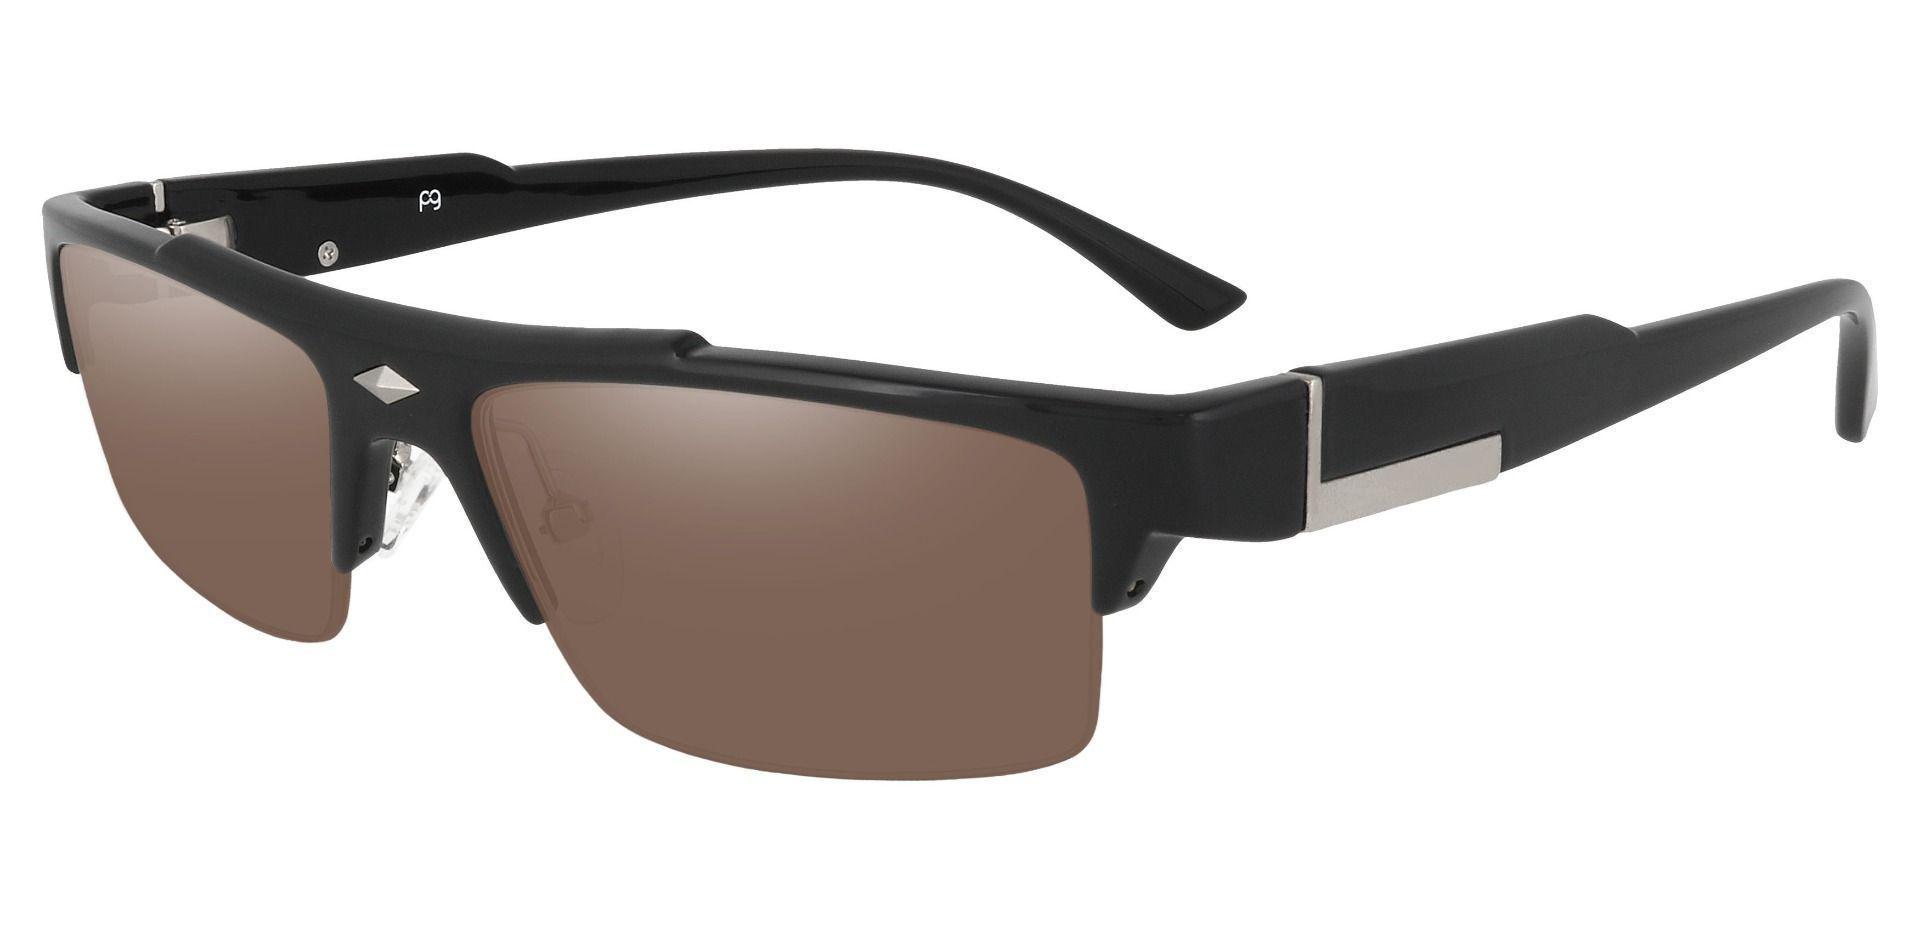 Sven Rectangle Prescription Sunglasses - Black Frame With Brown Lenses